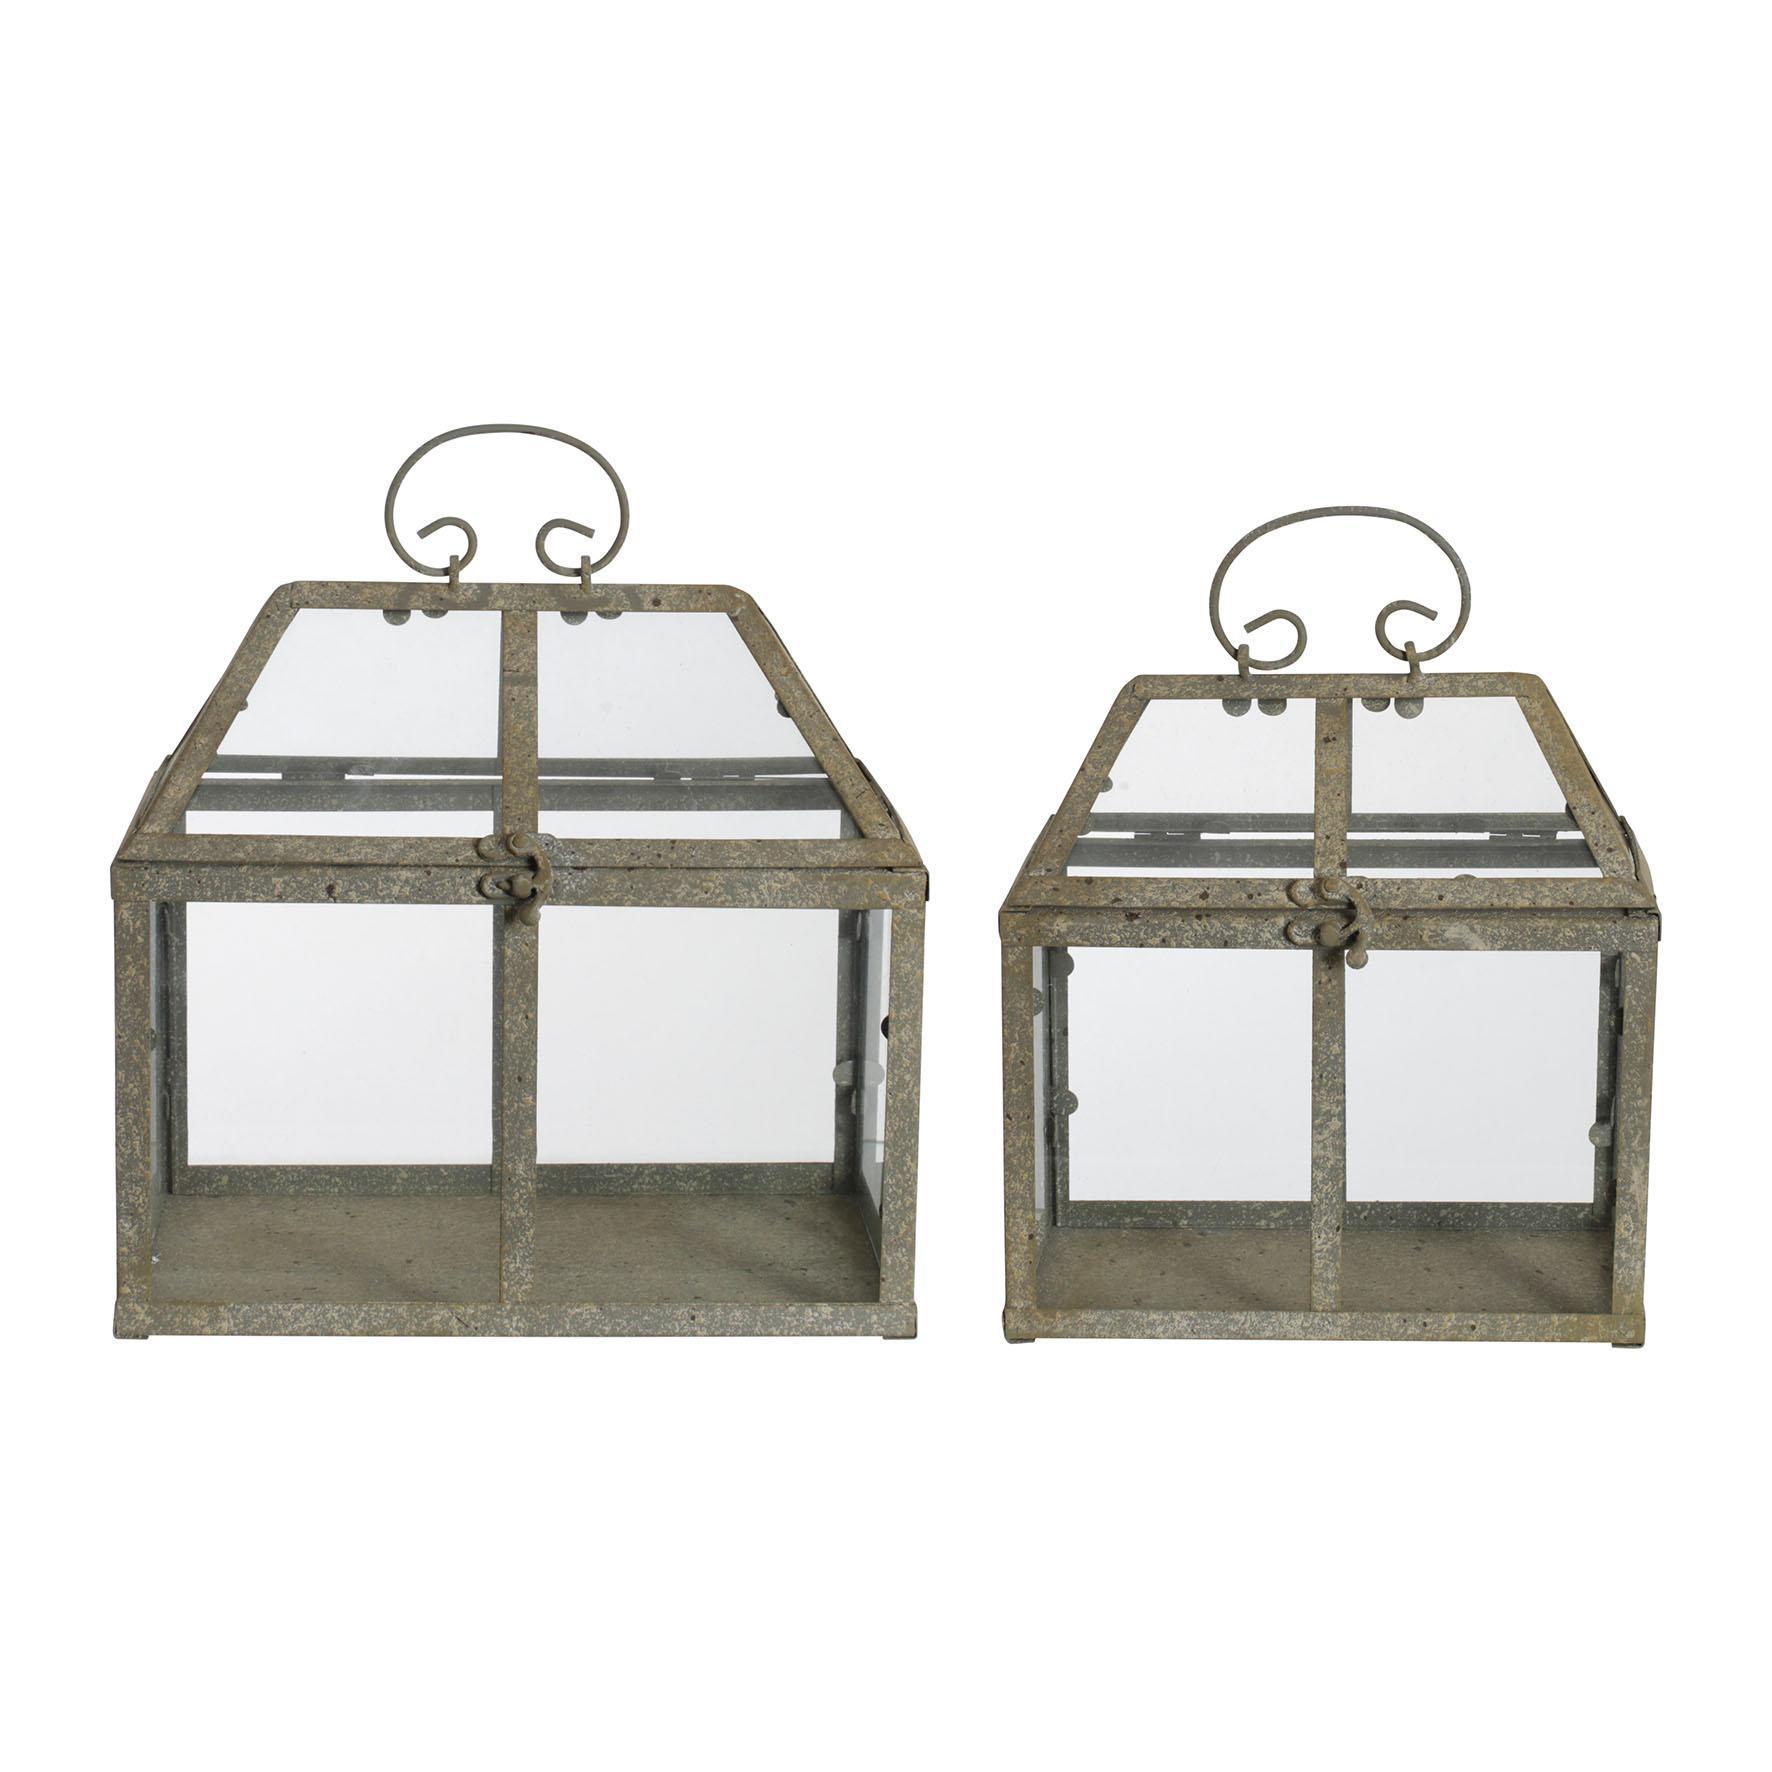 CÔTÉ TABLE Zahradní skleník Jardinet H26/23 Menší, multi barva, sklo, kov